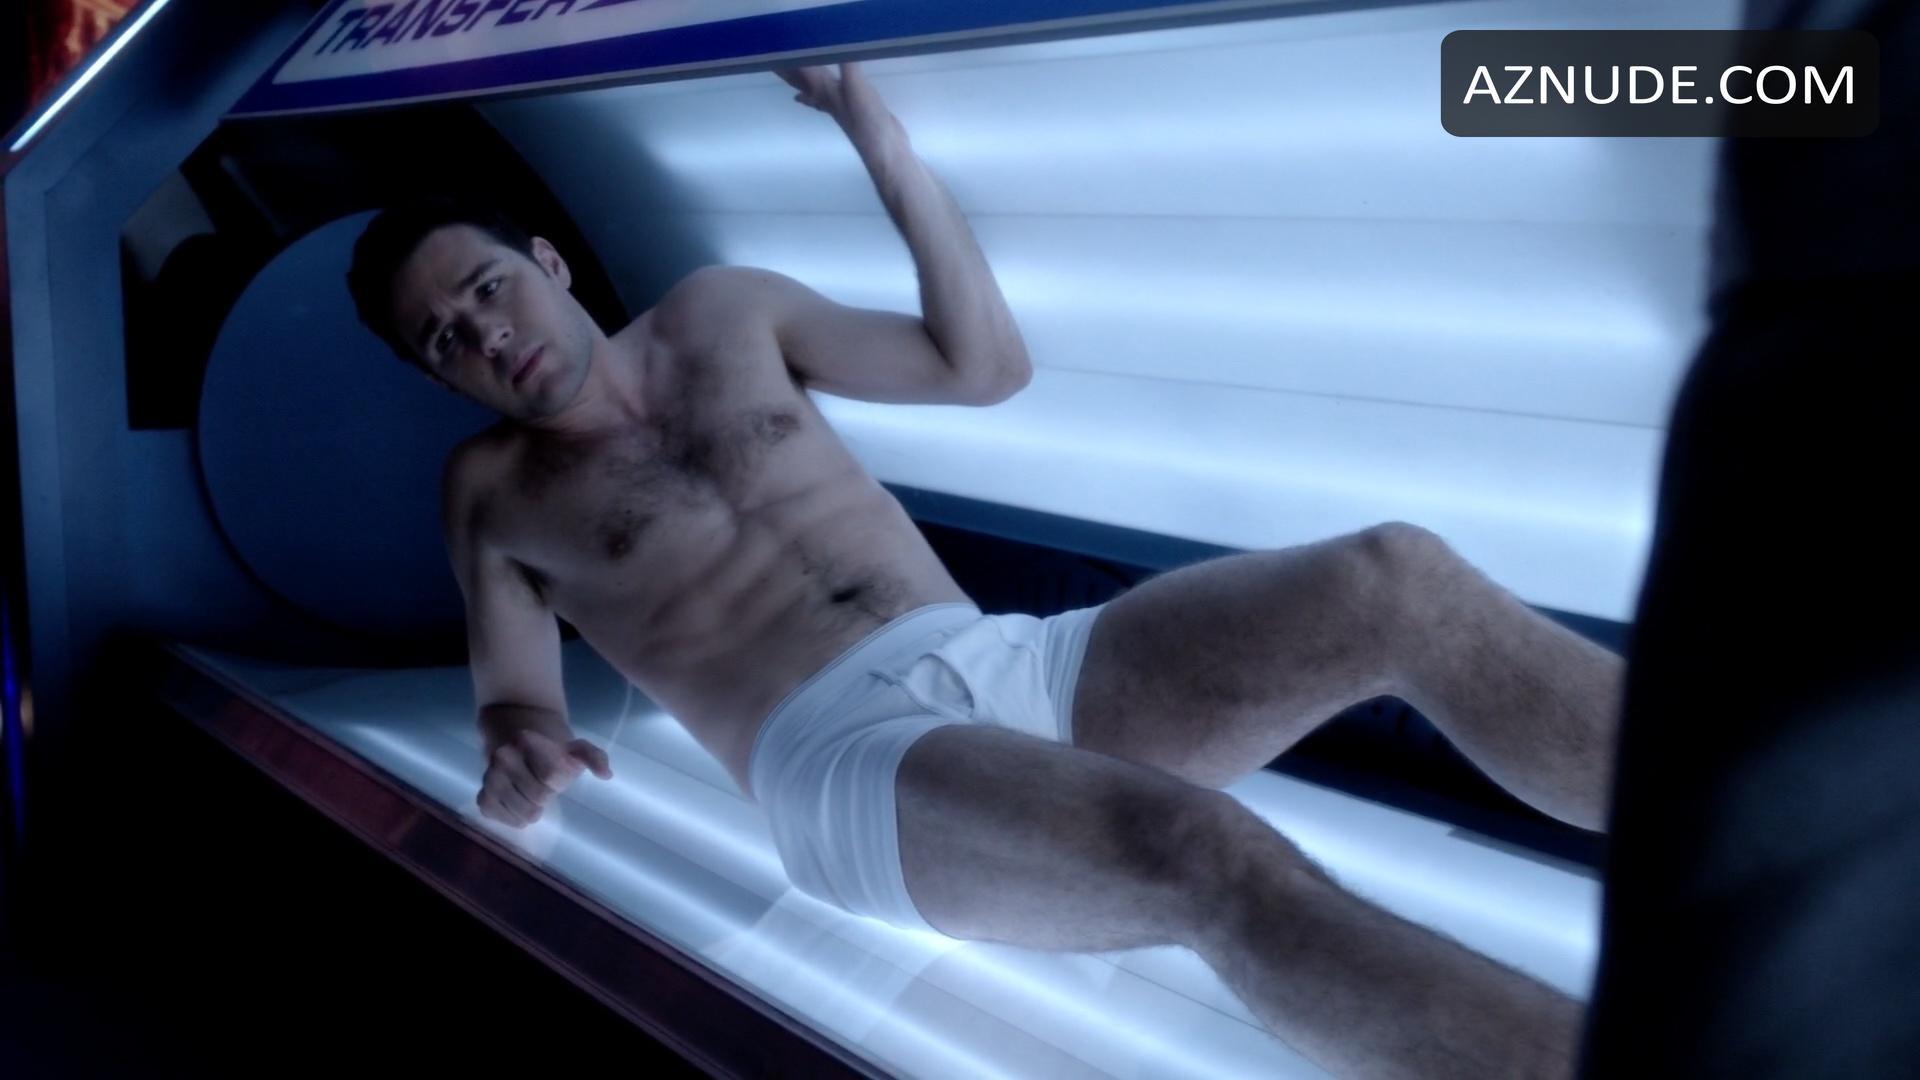 Andrea Denver Desnudo browse celebrity underwear images - page 40 - aznude men